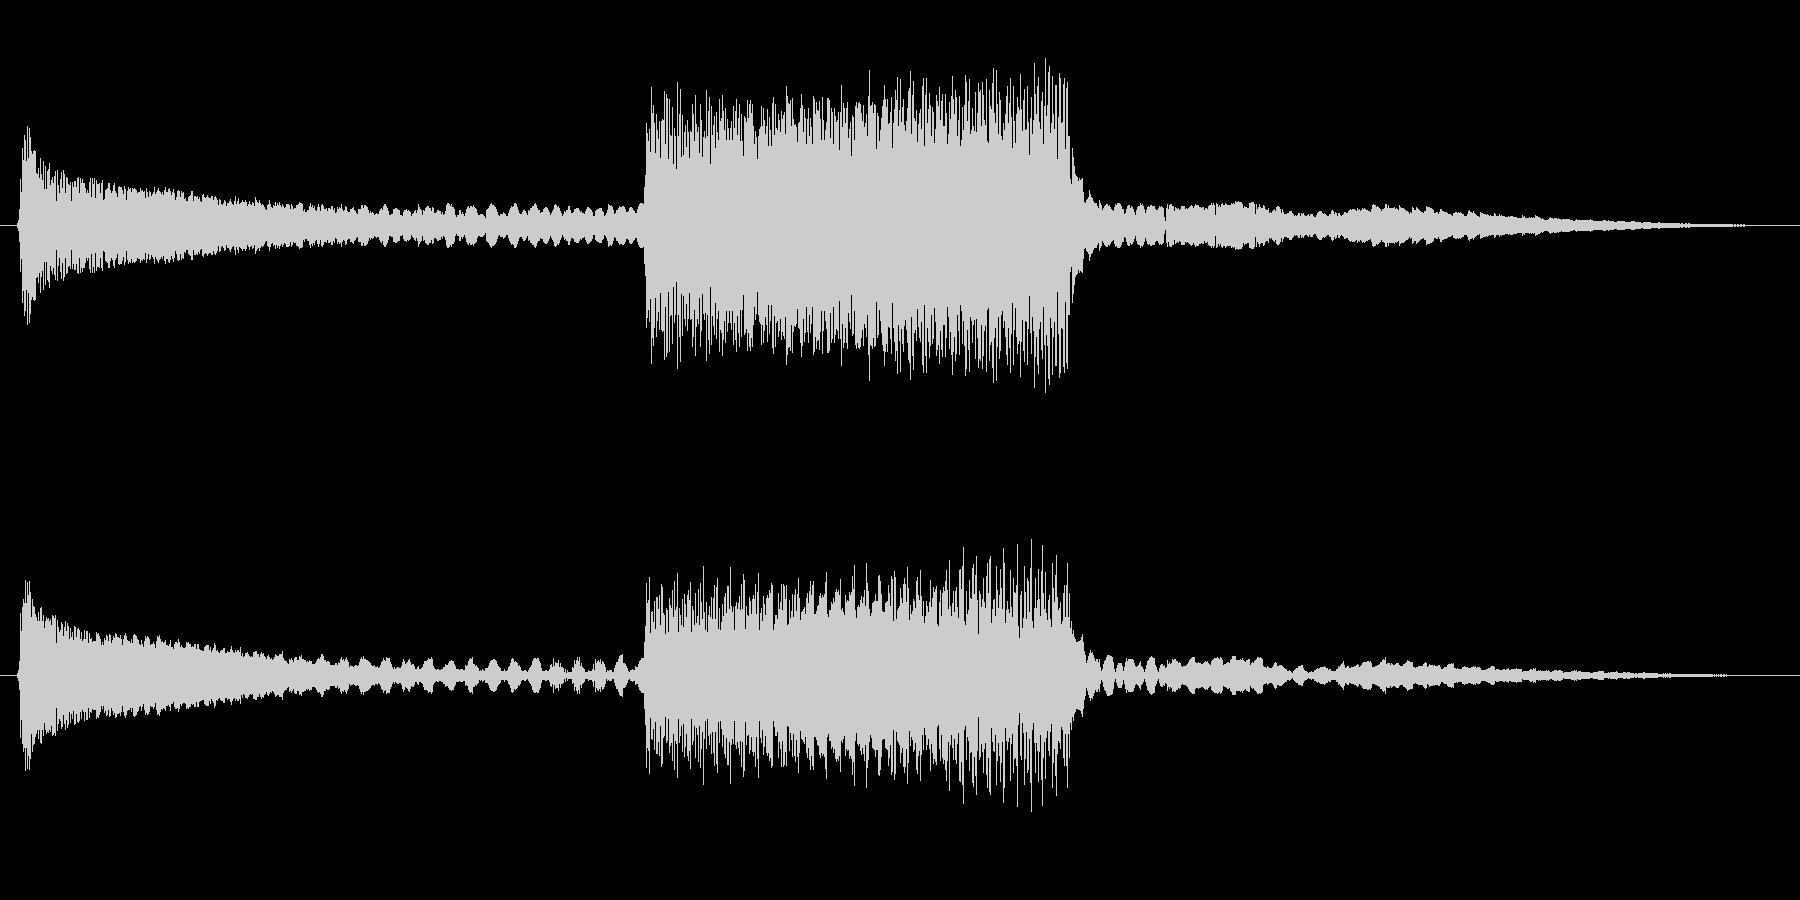 FI デバイス ライズフォール03の未再生の波形